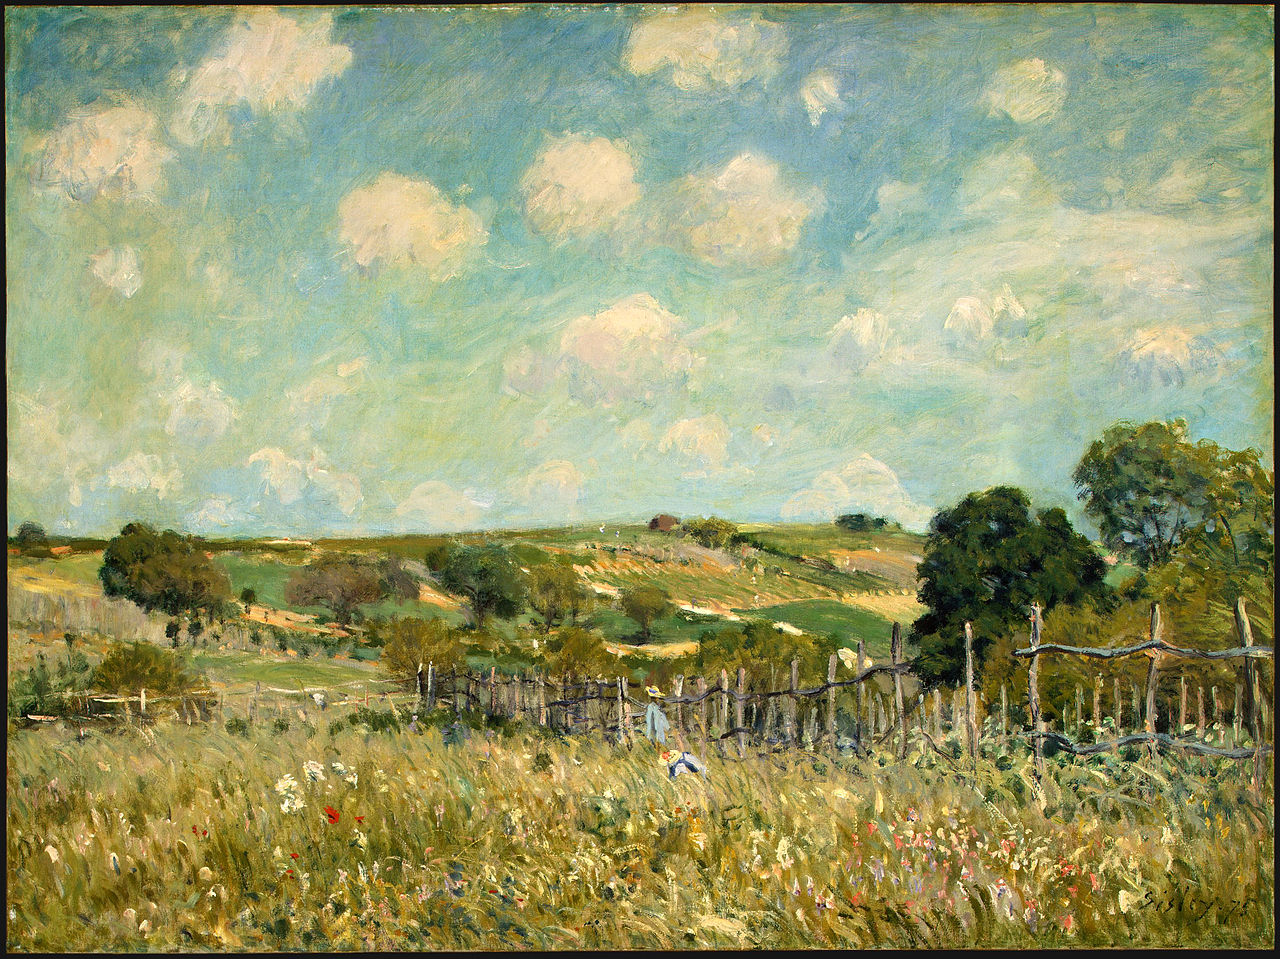 File:Meadow, Alfred Sisley, 1875.jpg - Wikipedia